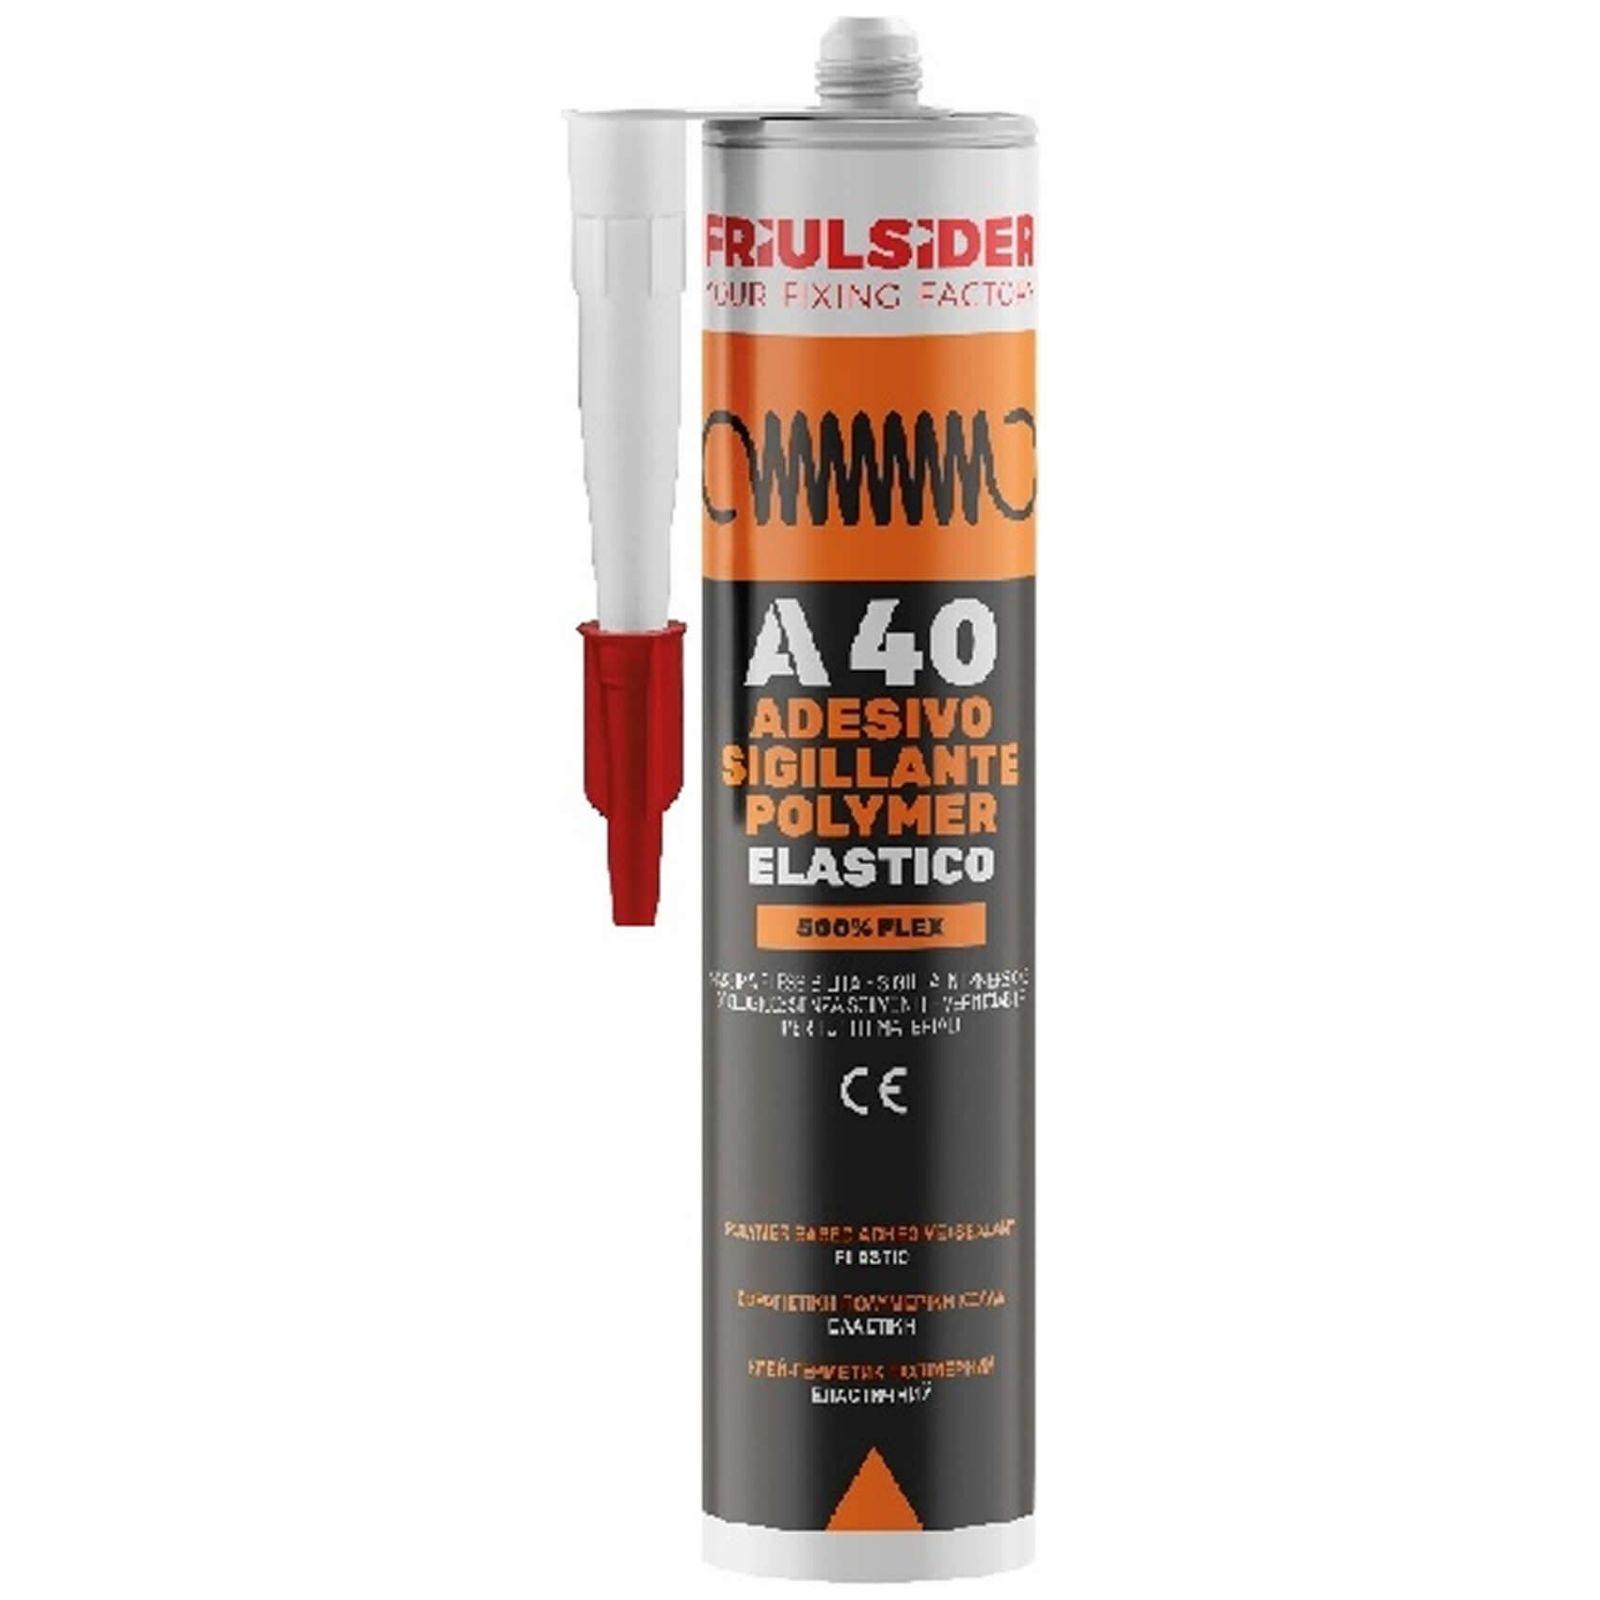 Friulsider adesivo sigillante elastico flex A40 bianco 290ml